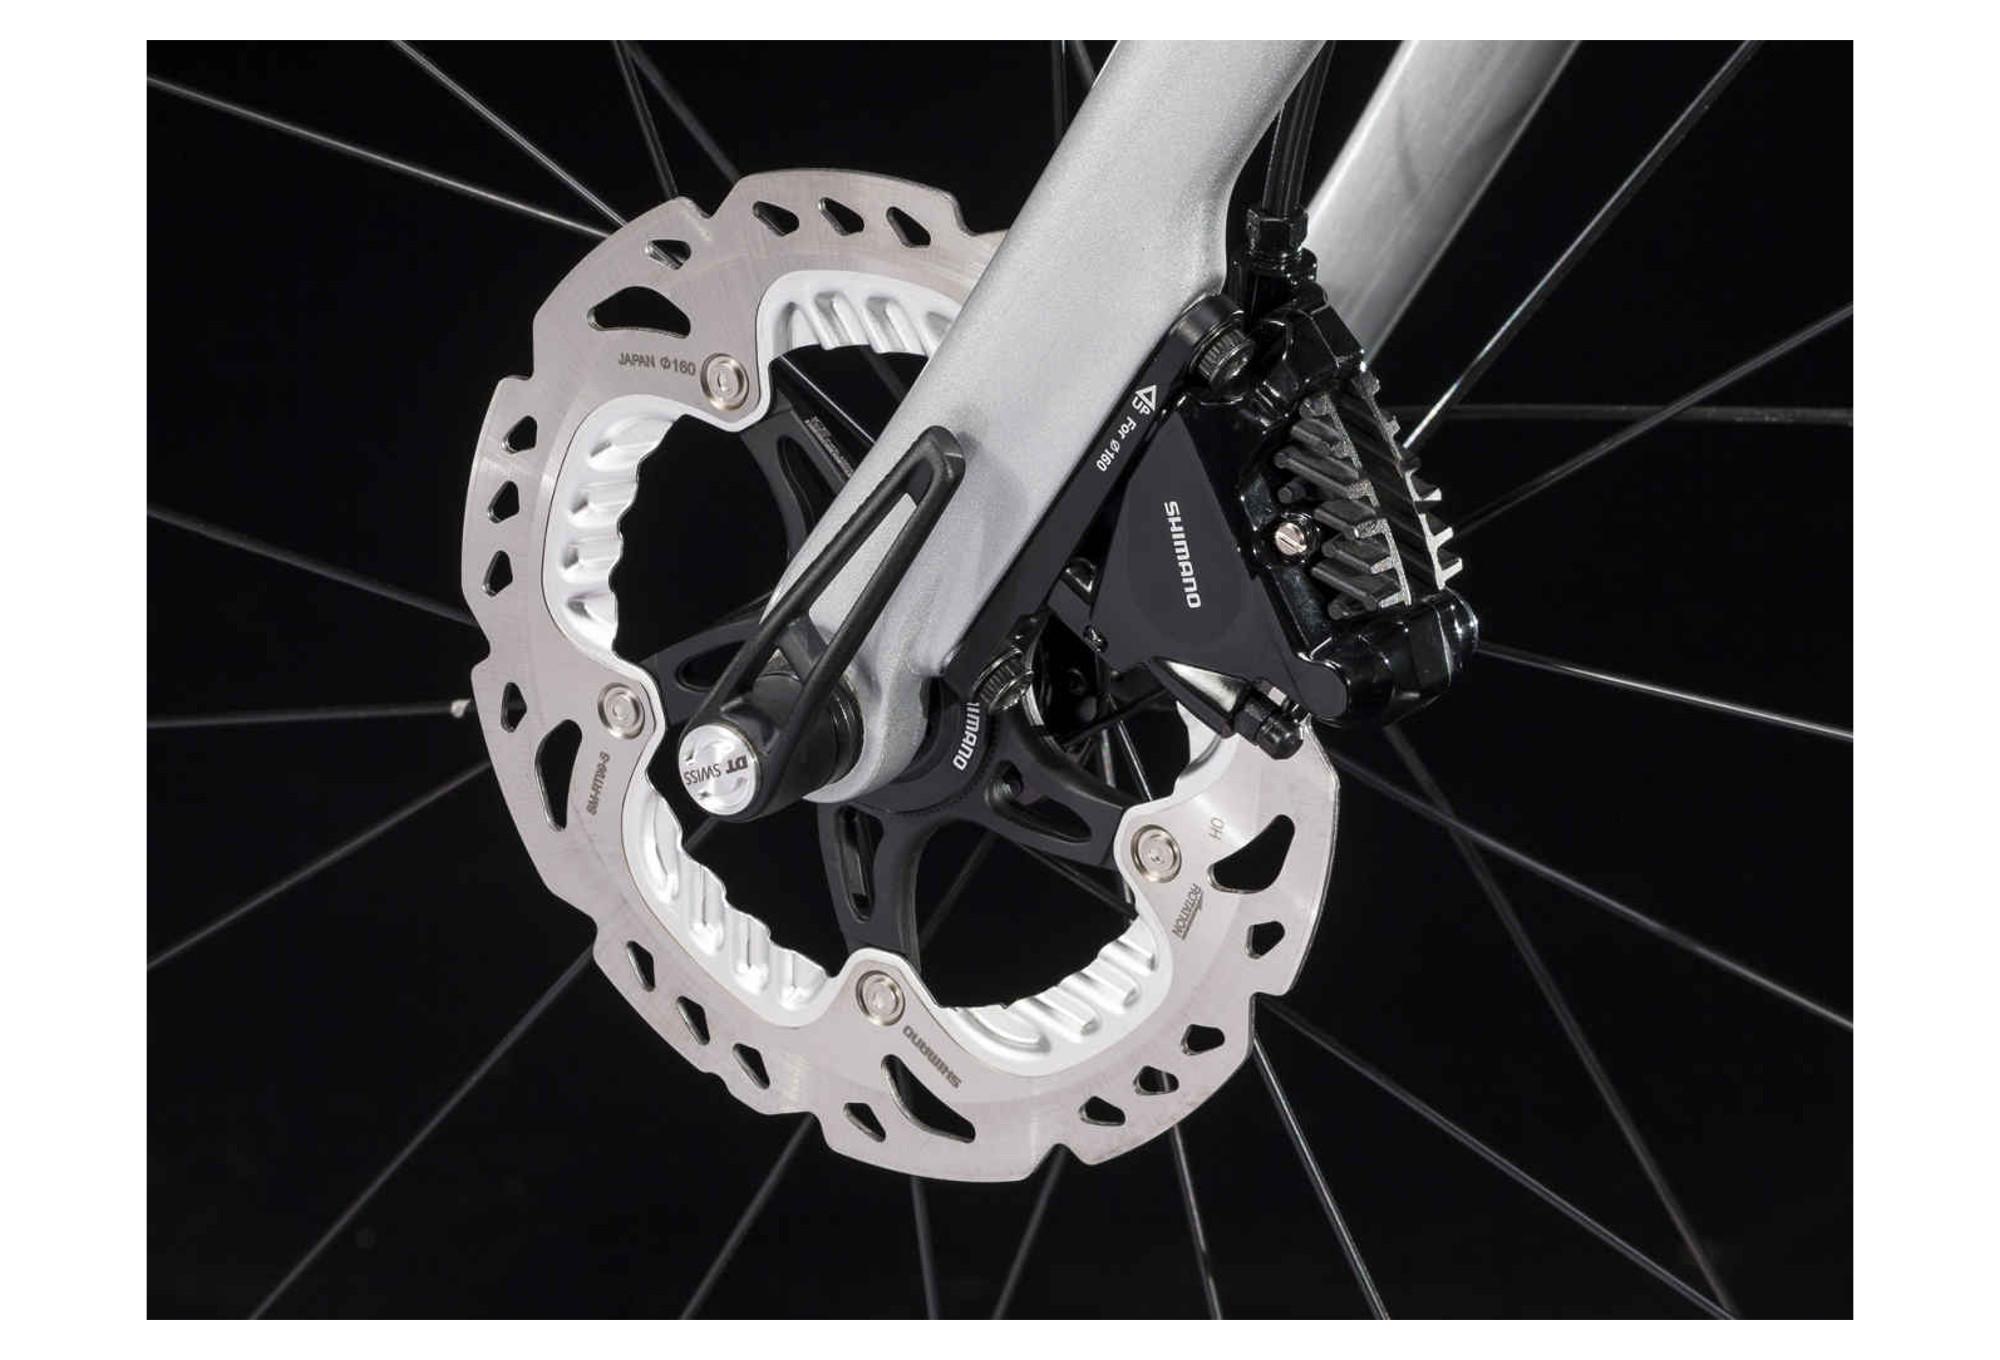 4e931625791 Women Trek Road Bike Domane SL 5 Disc 2018 Shimano 105 11S ...